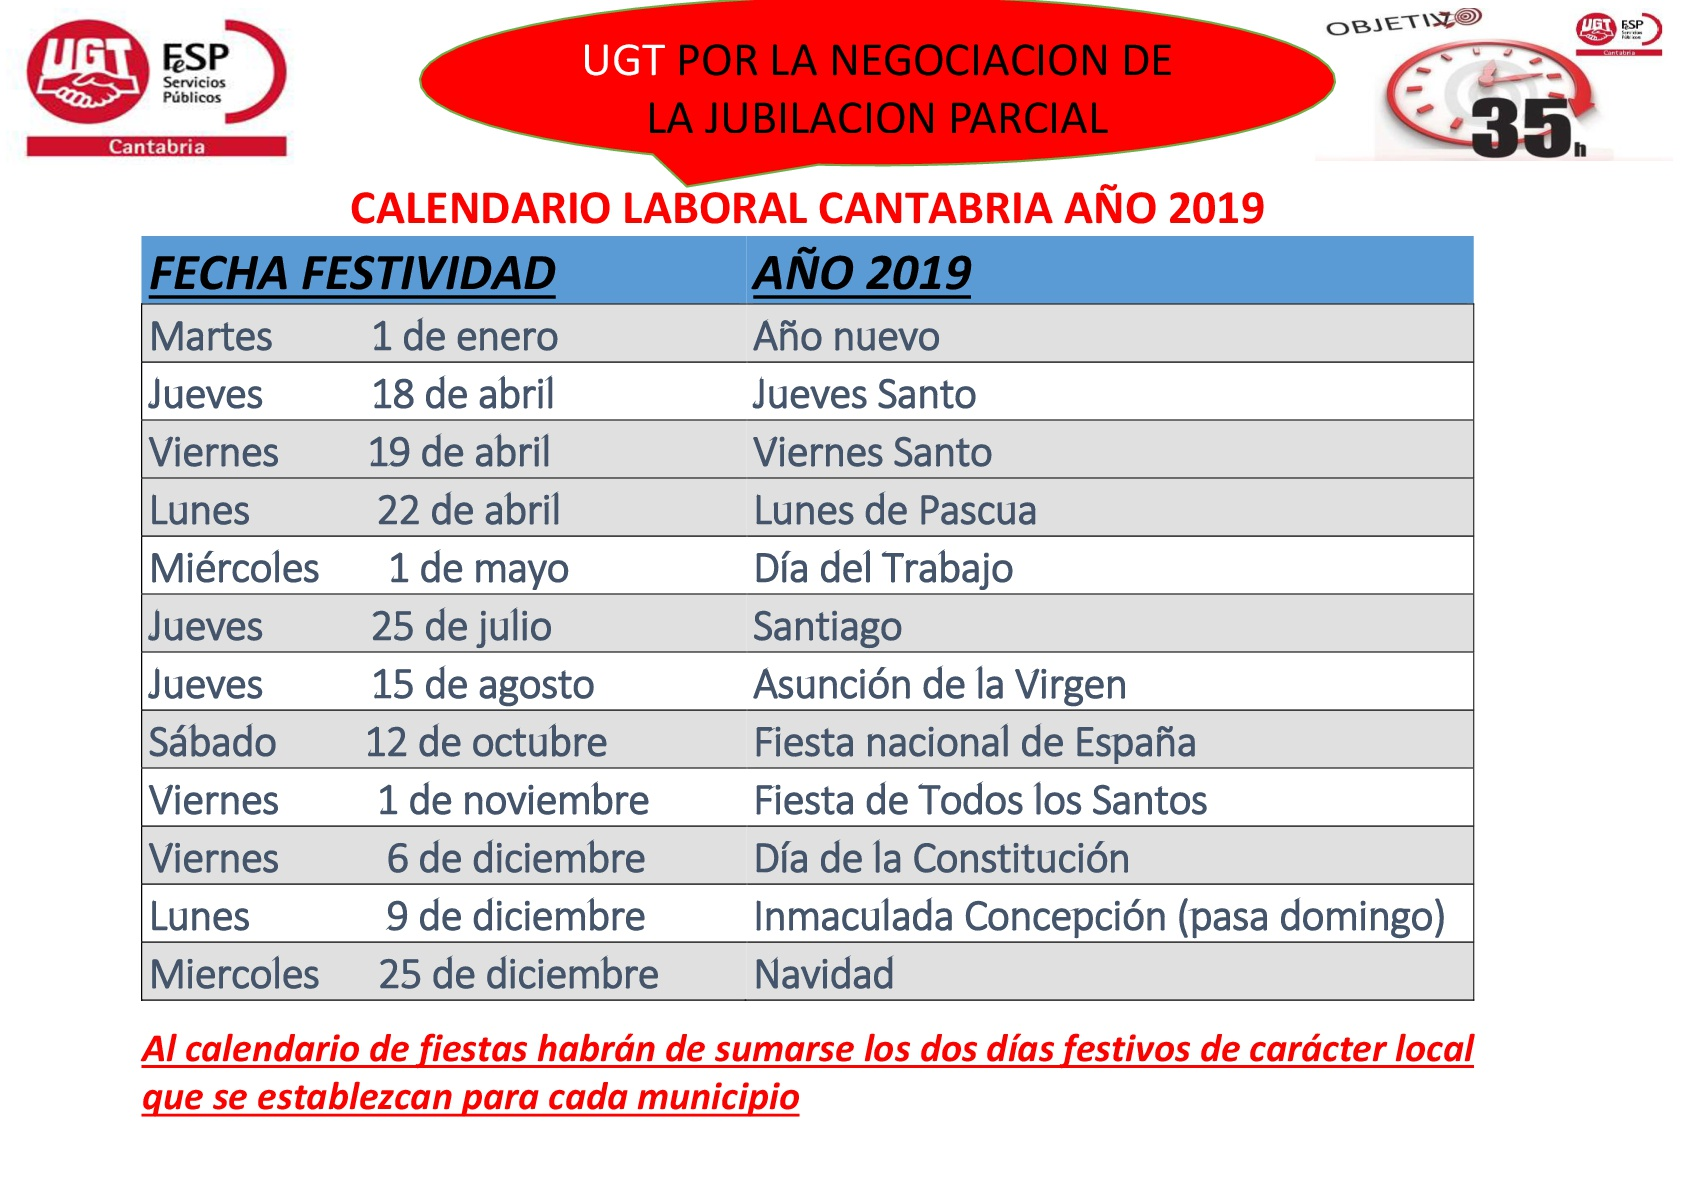 CALENDARIO LABORAL CANTABRIA AÑO 2019-001 (1)